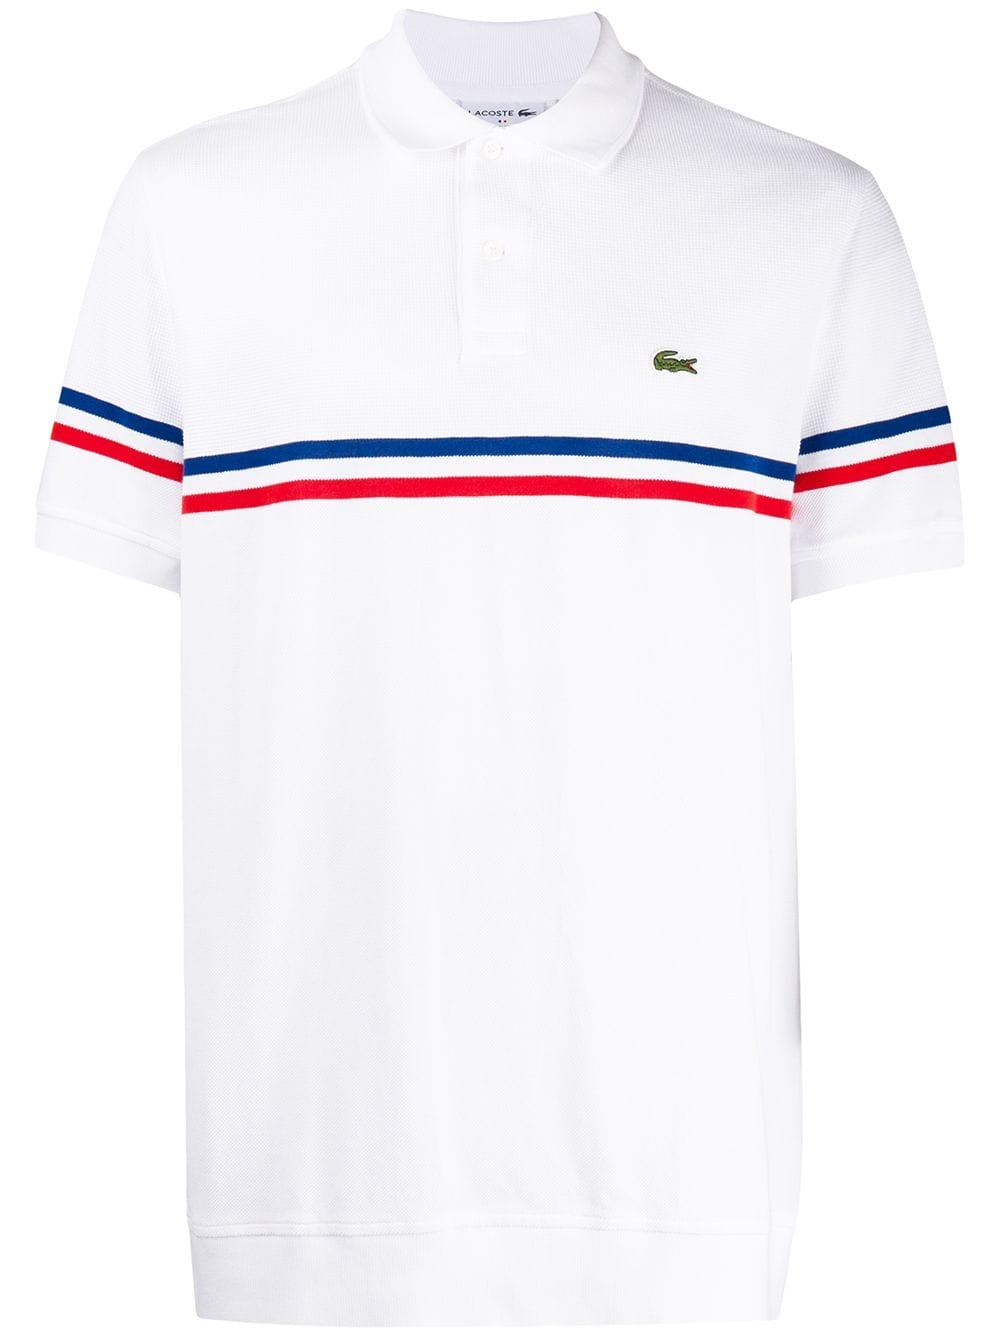 Contrast Stripe Polo Shirt In White Striped Polo Shirt Polo